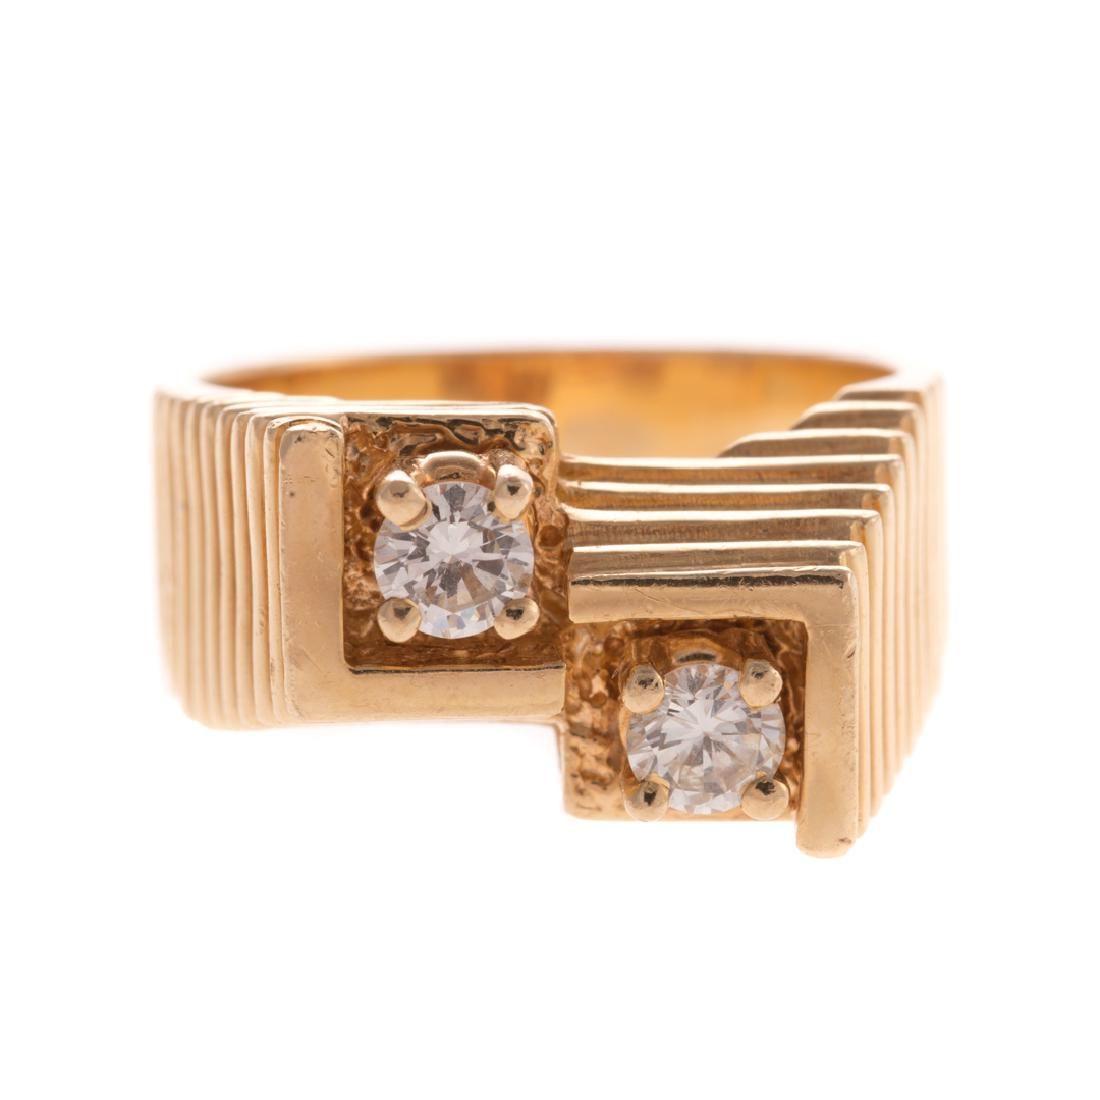 A Gentlemen's Diamond Ring in 14K Gold